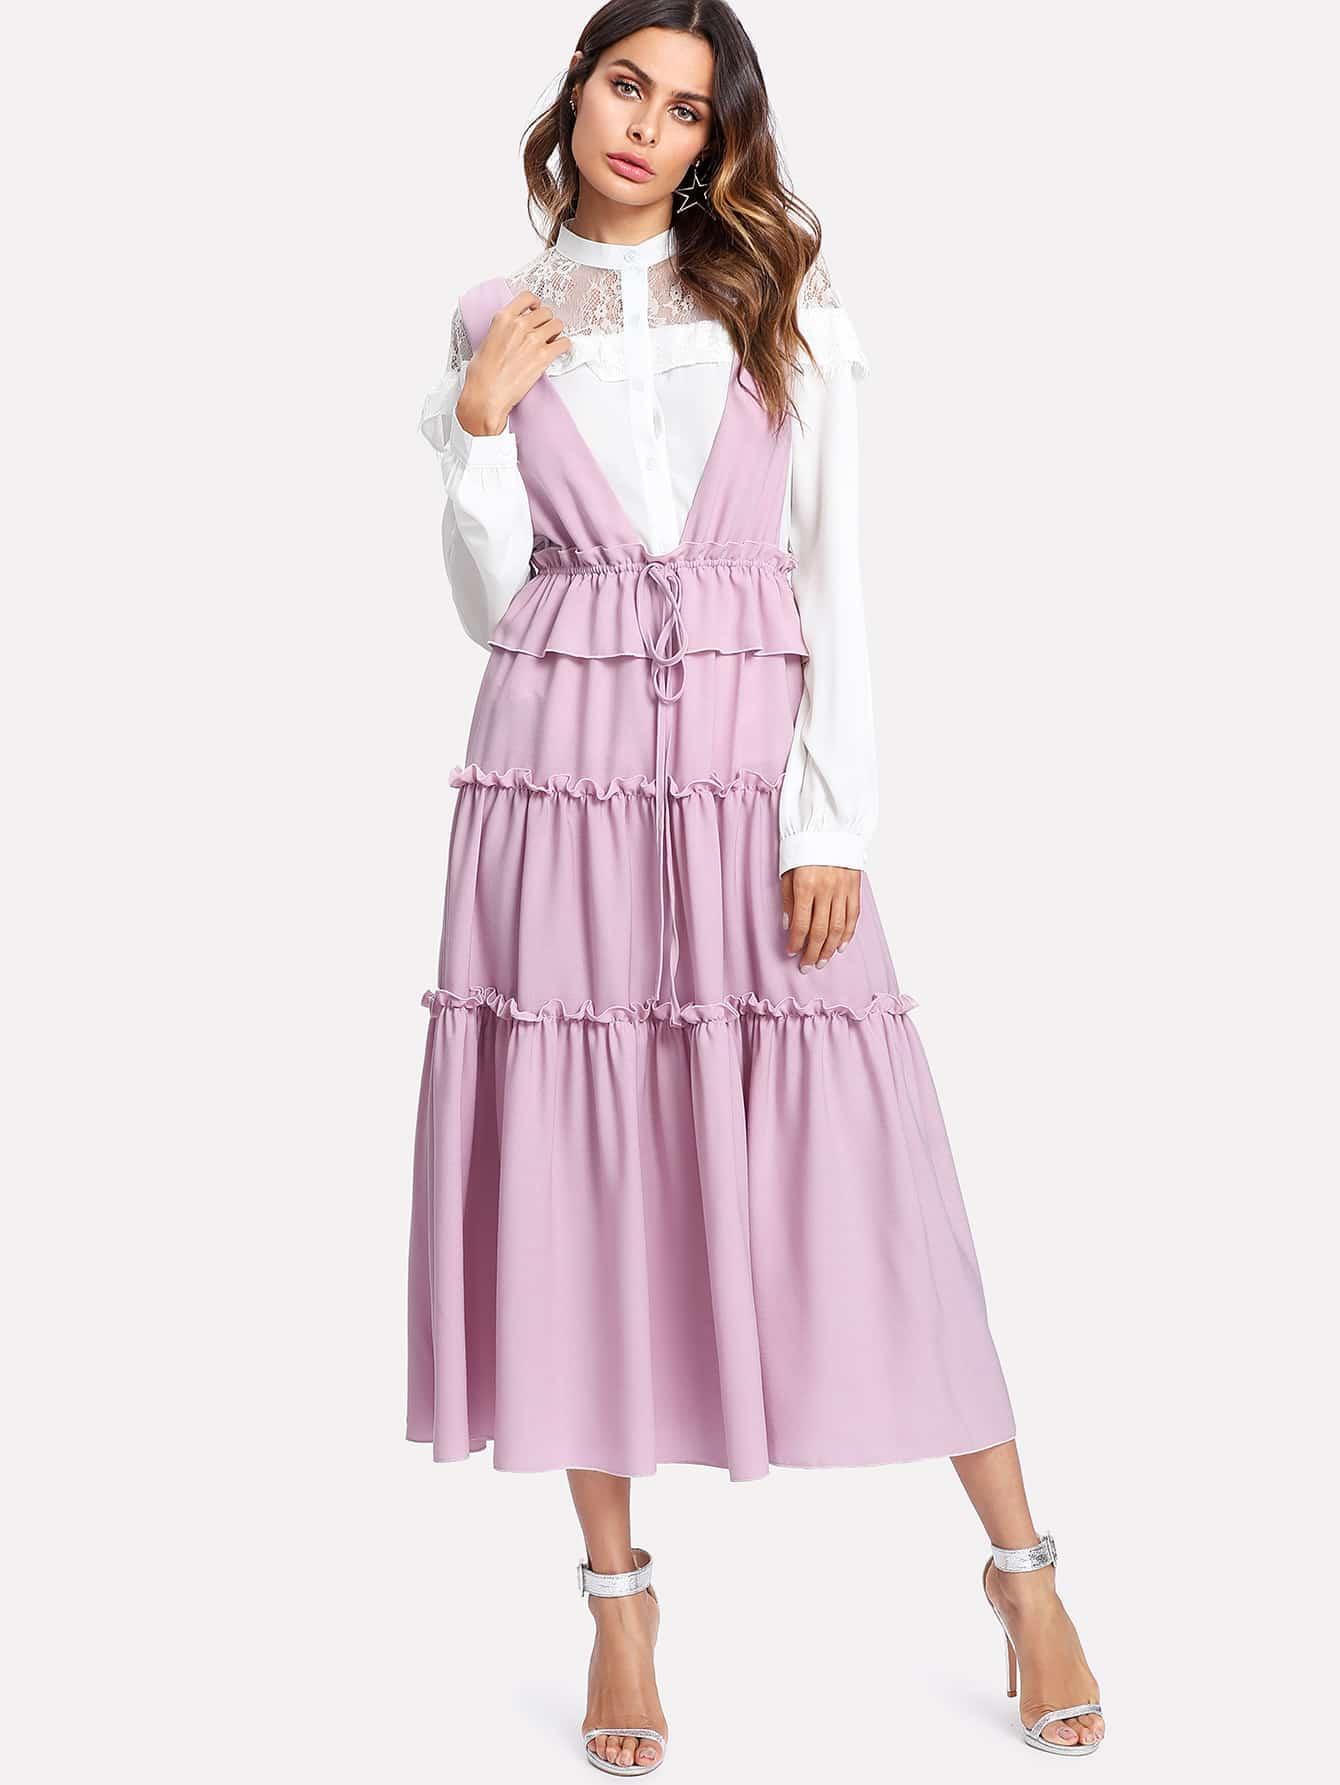 Frill Detail Tiered Drawstring Dress frill detail bishop sleeve tiered botanical dress